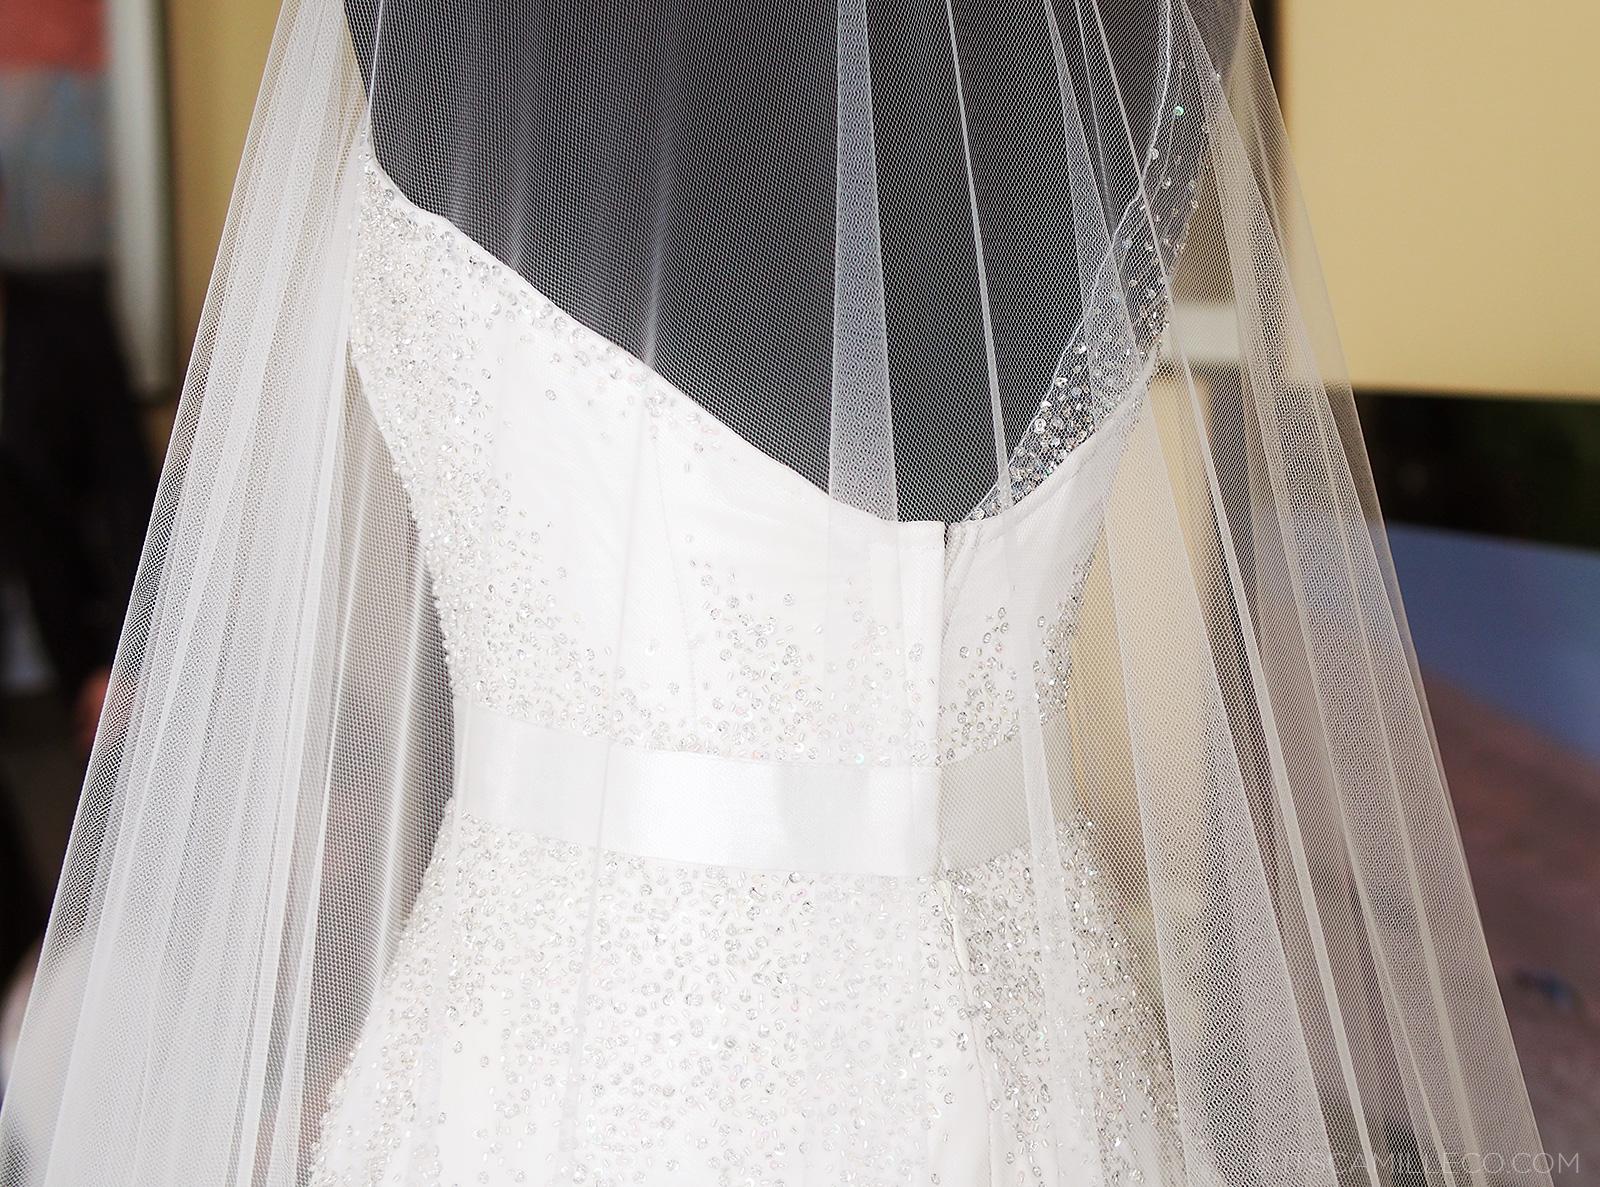 Camille Wedding Dress 96 Fresh itscamilleco itscamilleco itscamilleco